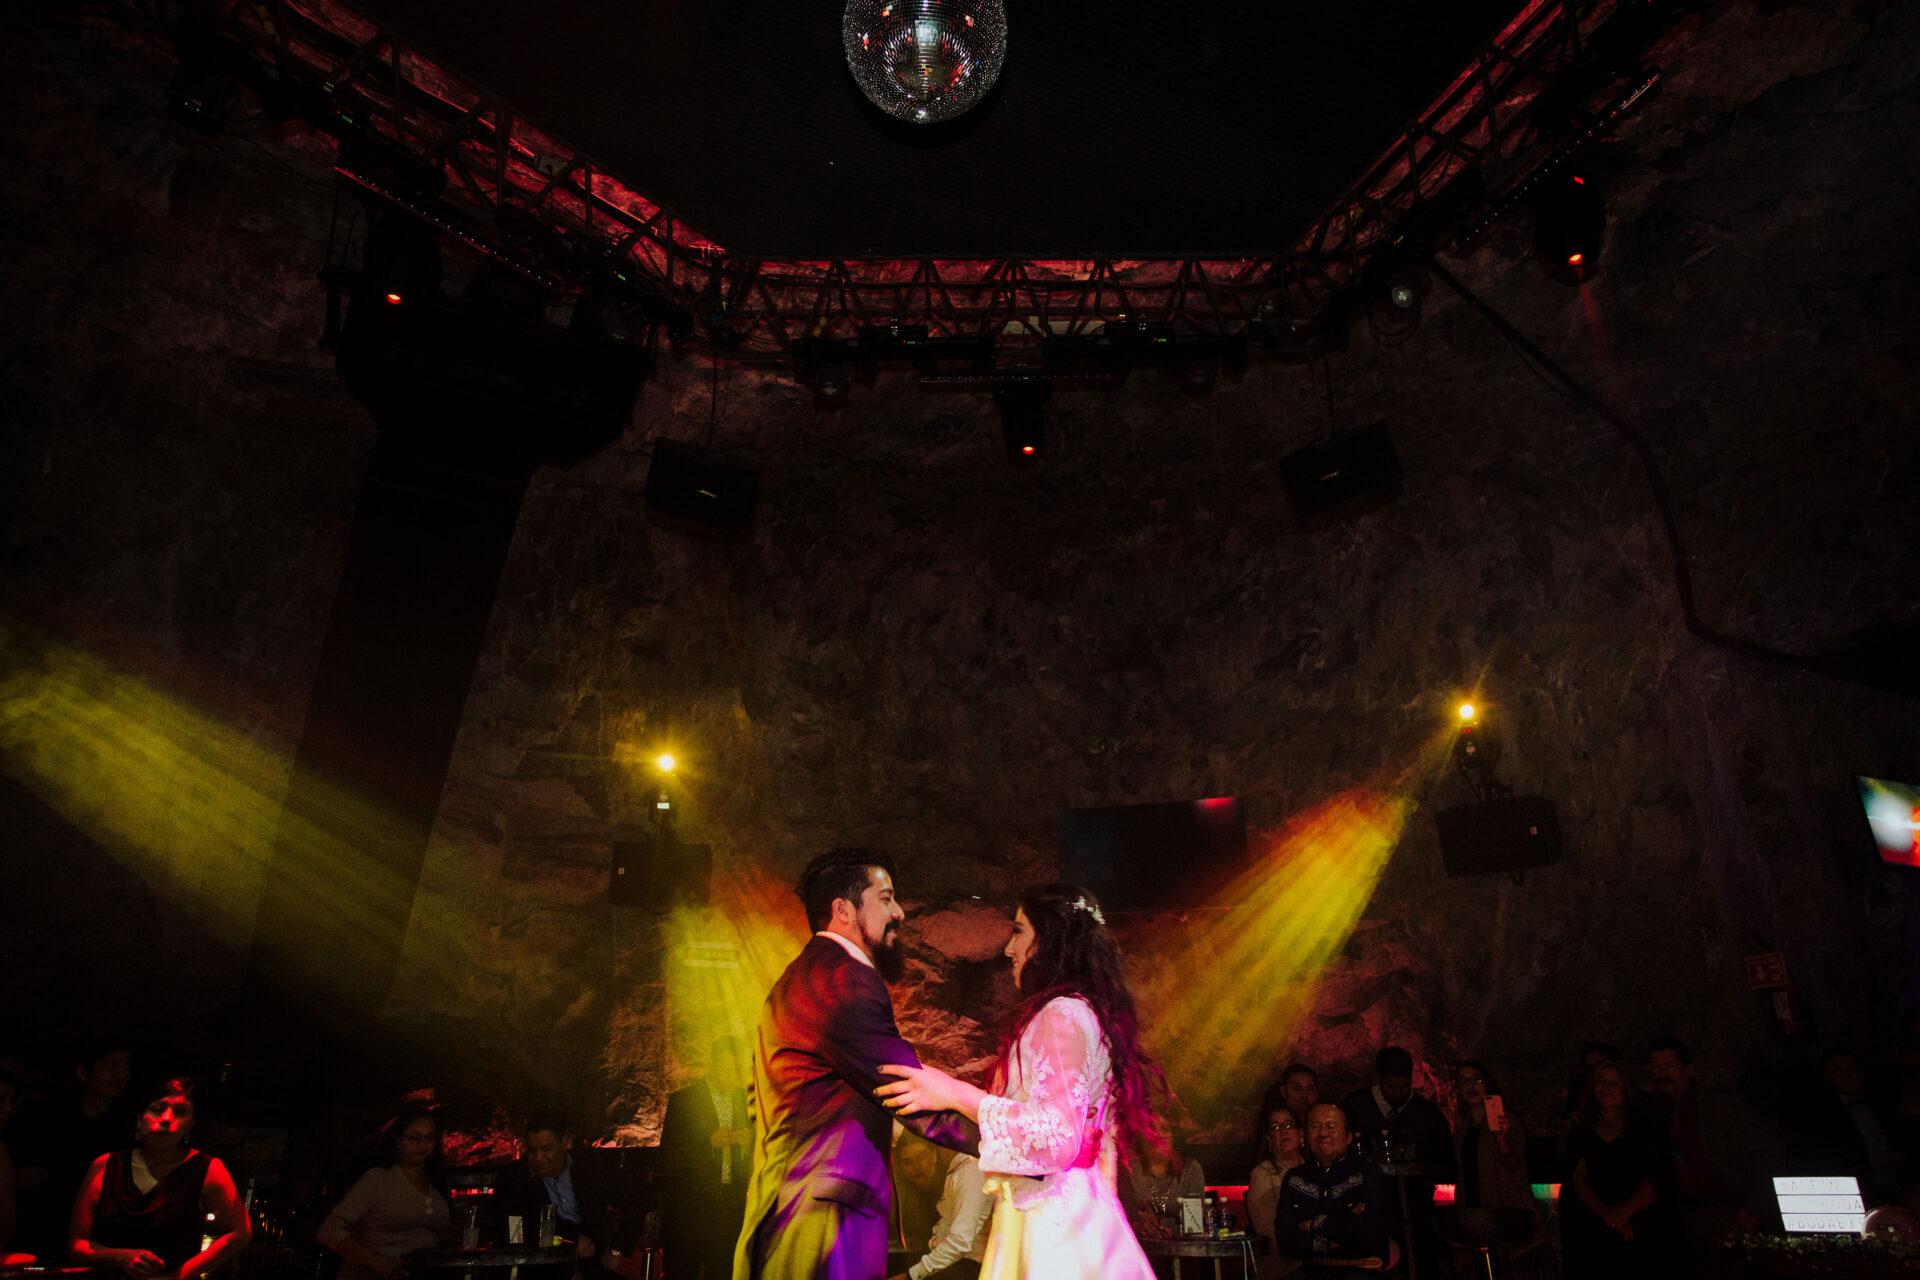 javier_noriega_fotografo_bodas_la_mina_club_zacatecas_wedding_photographer17